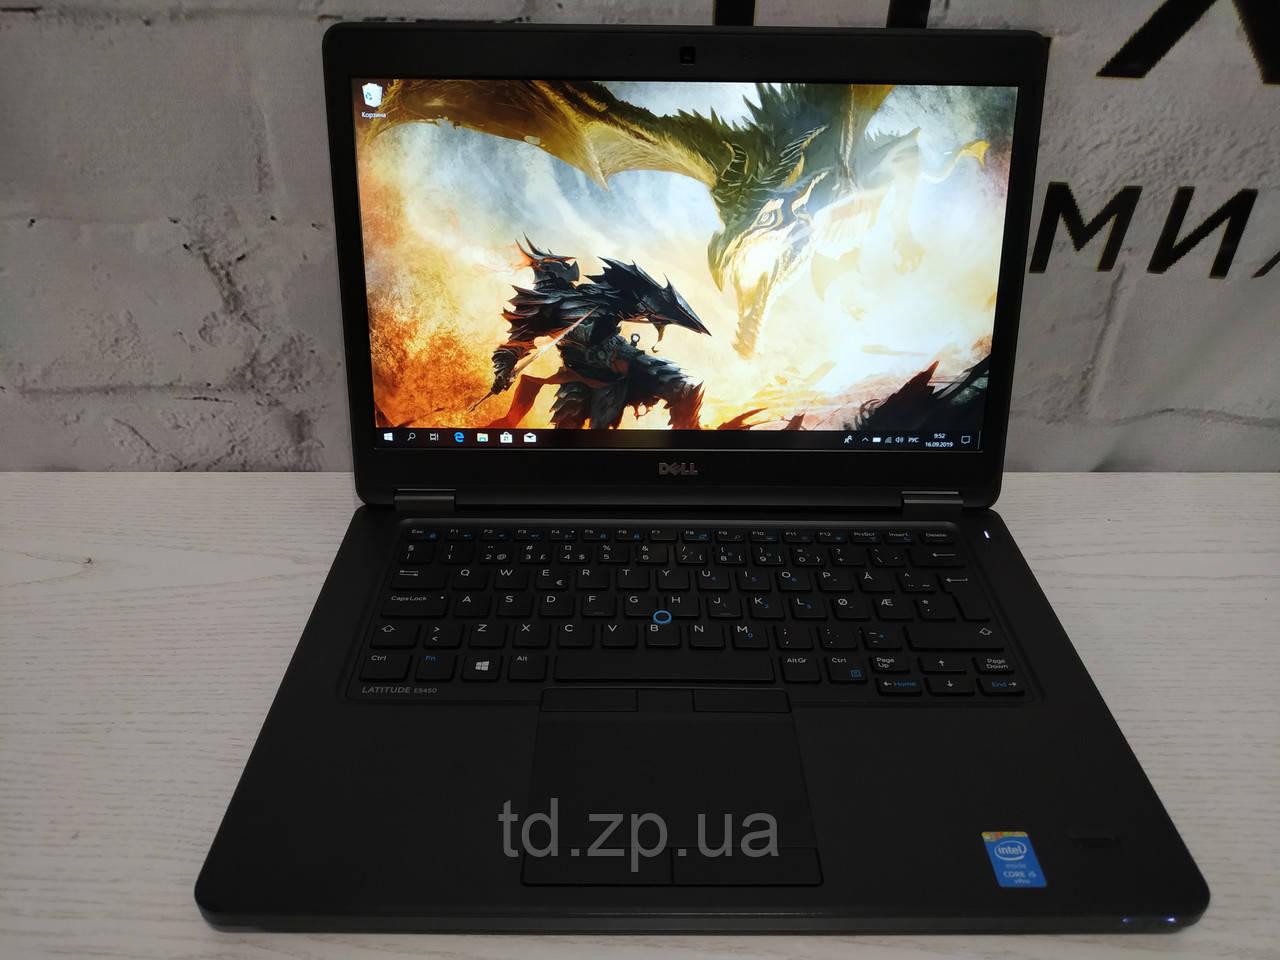 Ноутбук Dell Latitude E5450 14.1/ intel core i5-5300u 4x2.9Ghz/8GB DDR 3/ 128 Gb SSD/  Intel HD Graphics 5500